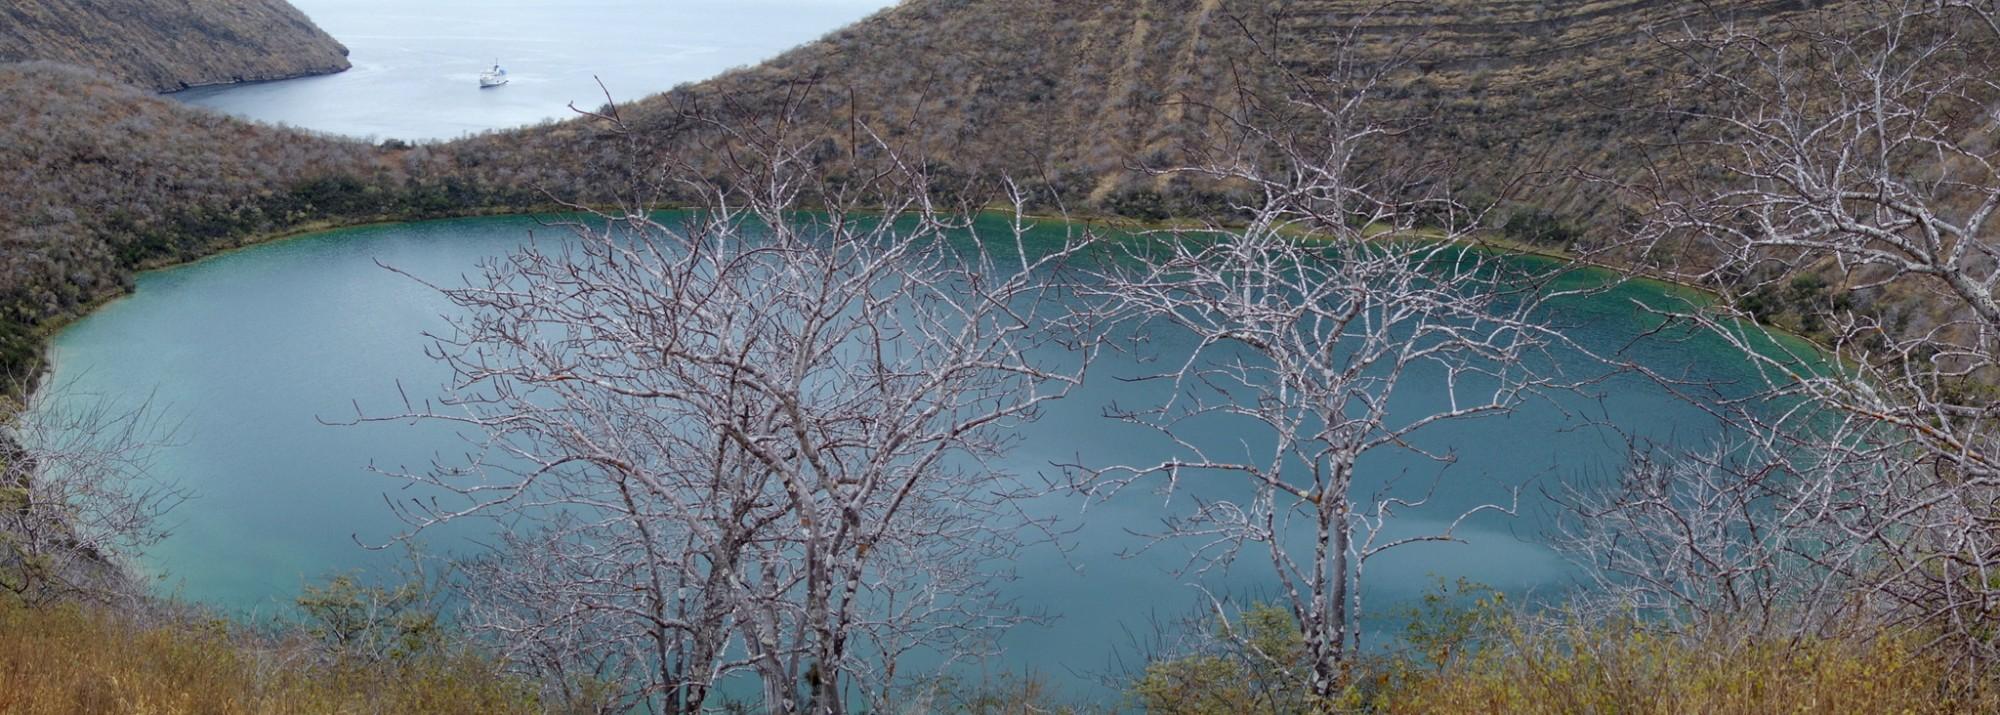 Galápagos, Tagus Cove: Blick über den Lake Darwin auf die Tagus Cove mit der Yacht La Pinta